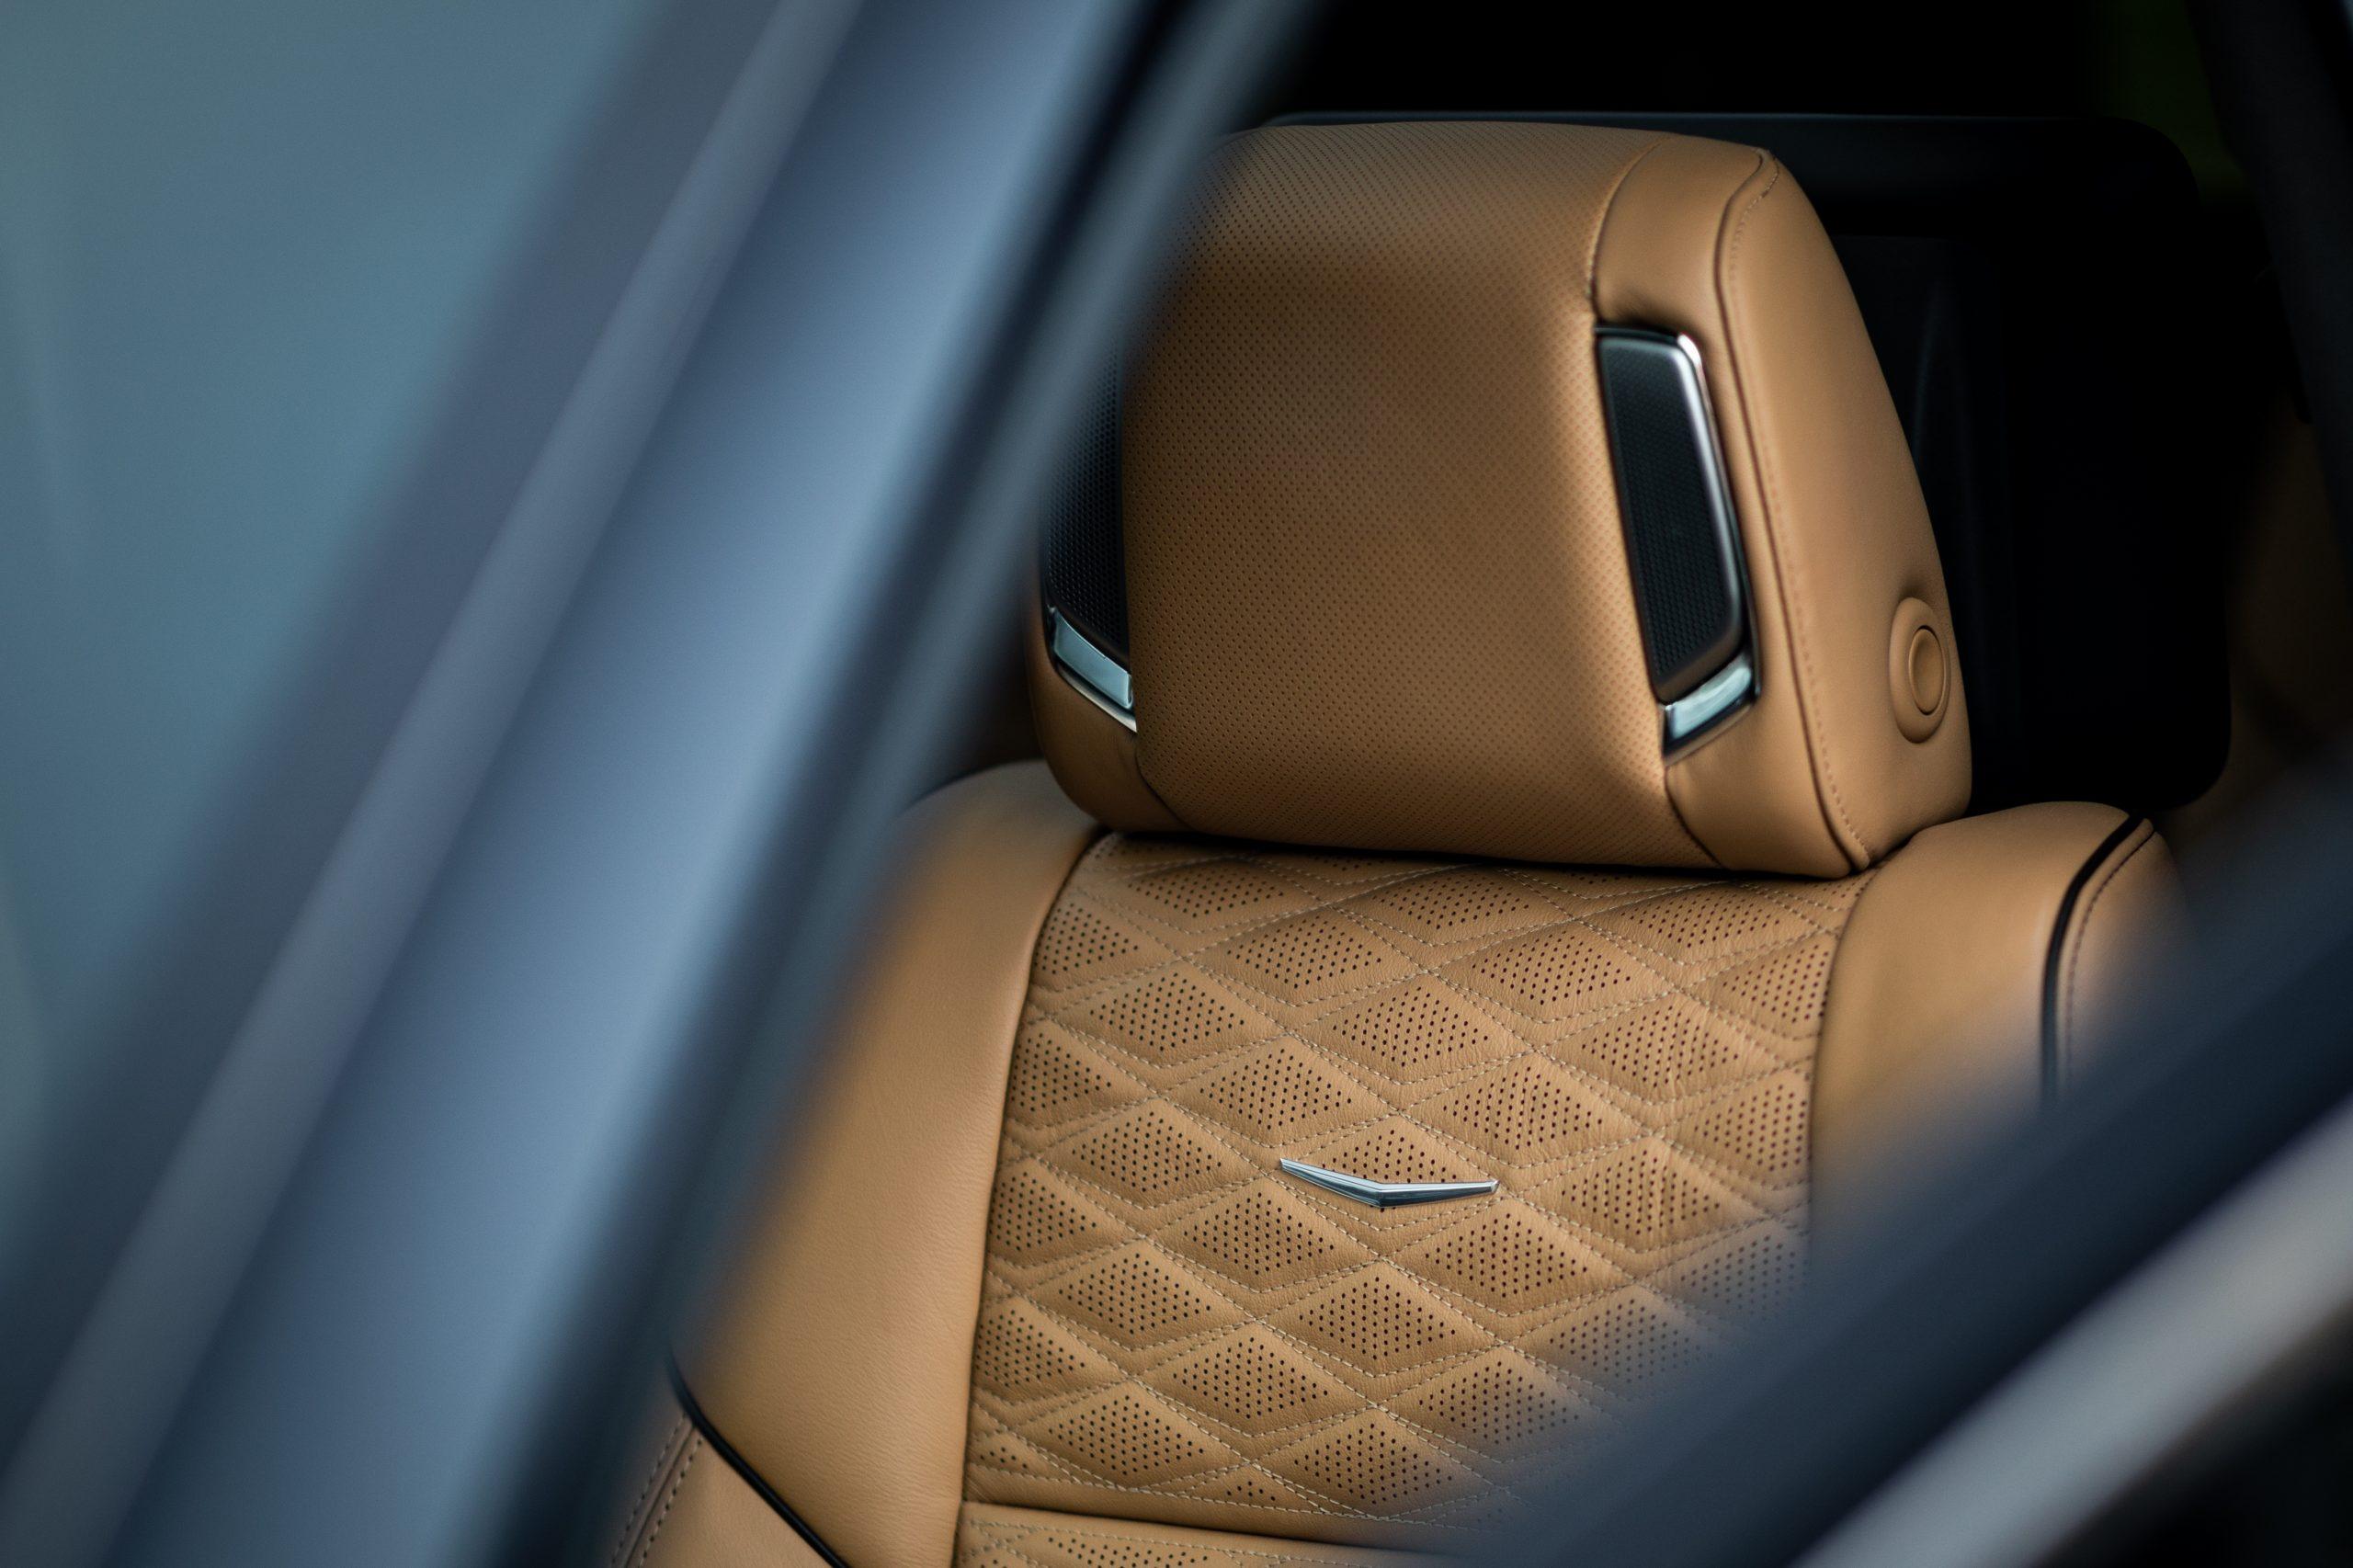 cadillac escalade interior seat headrest detail